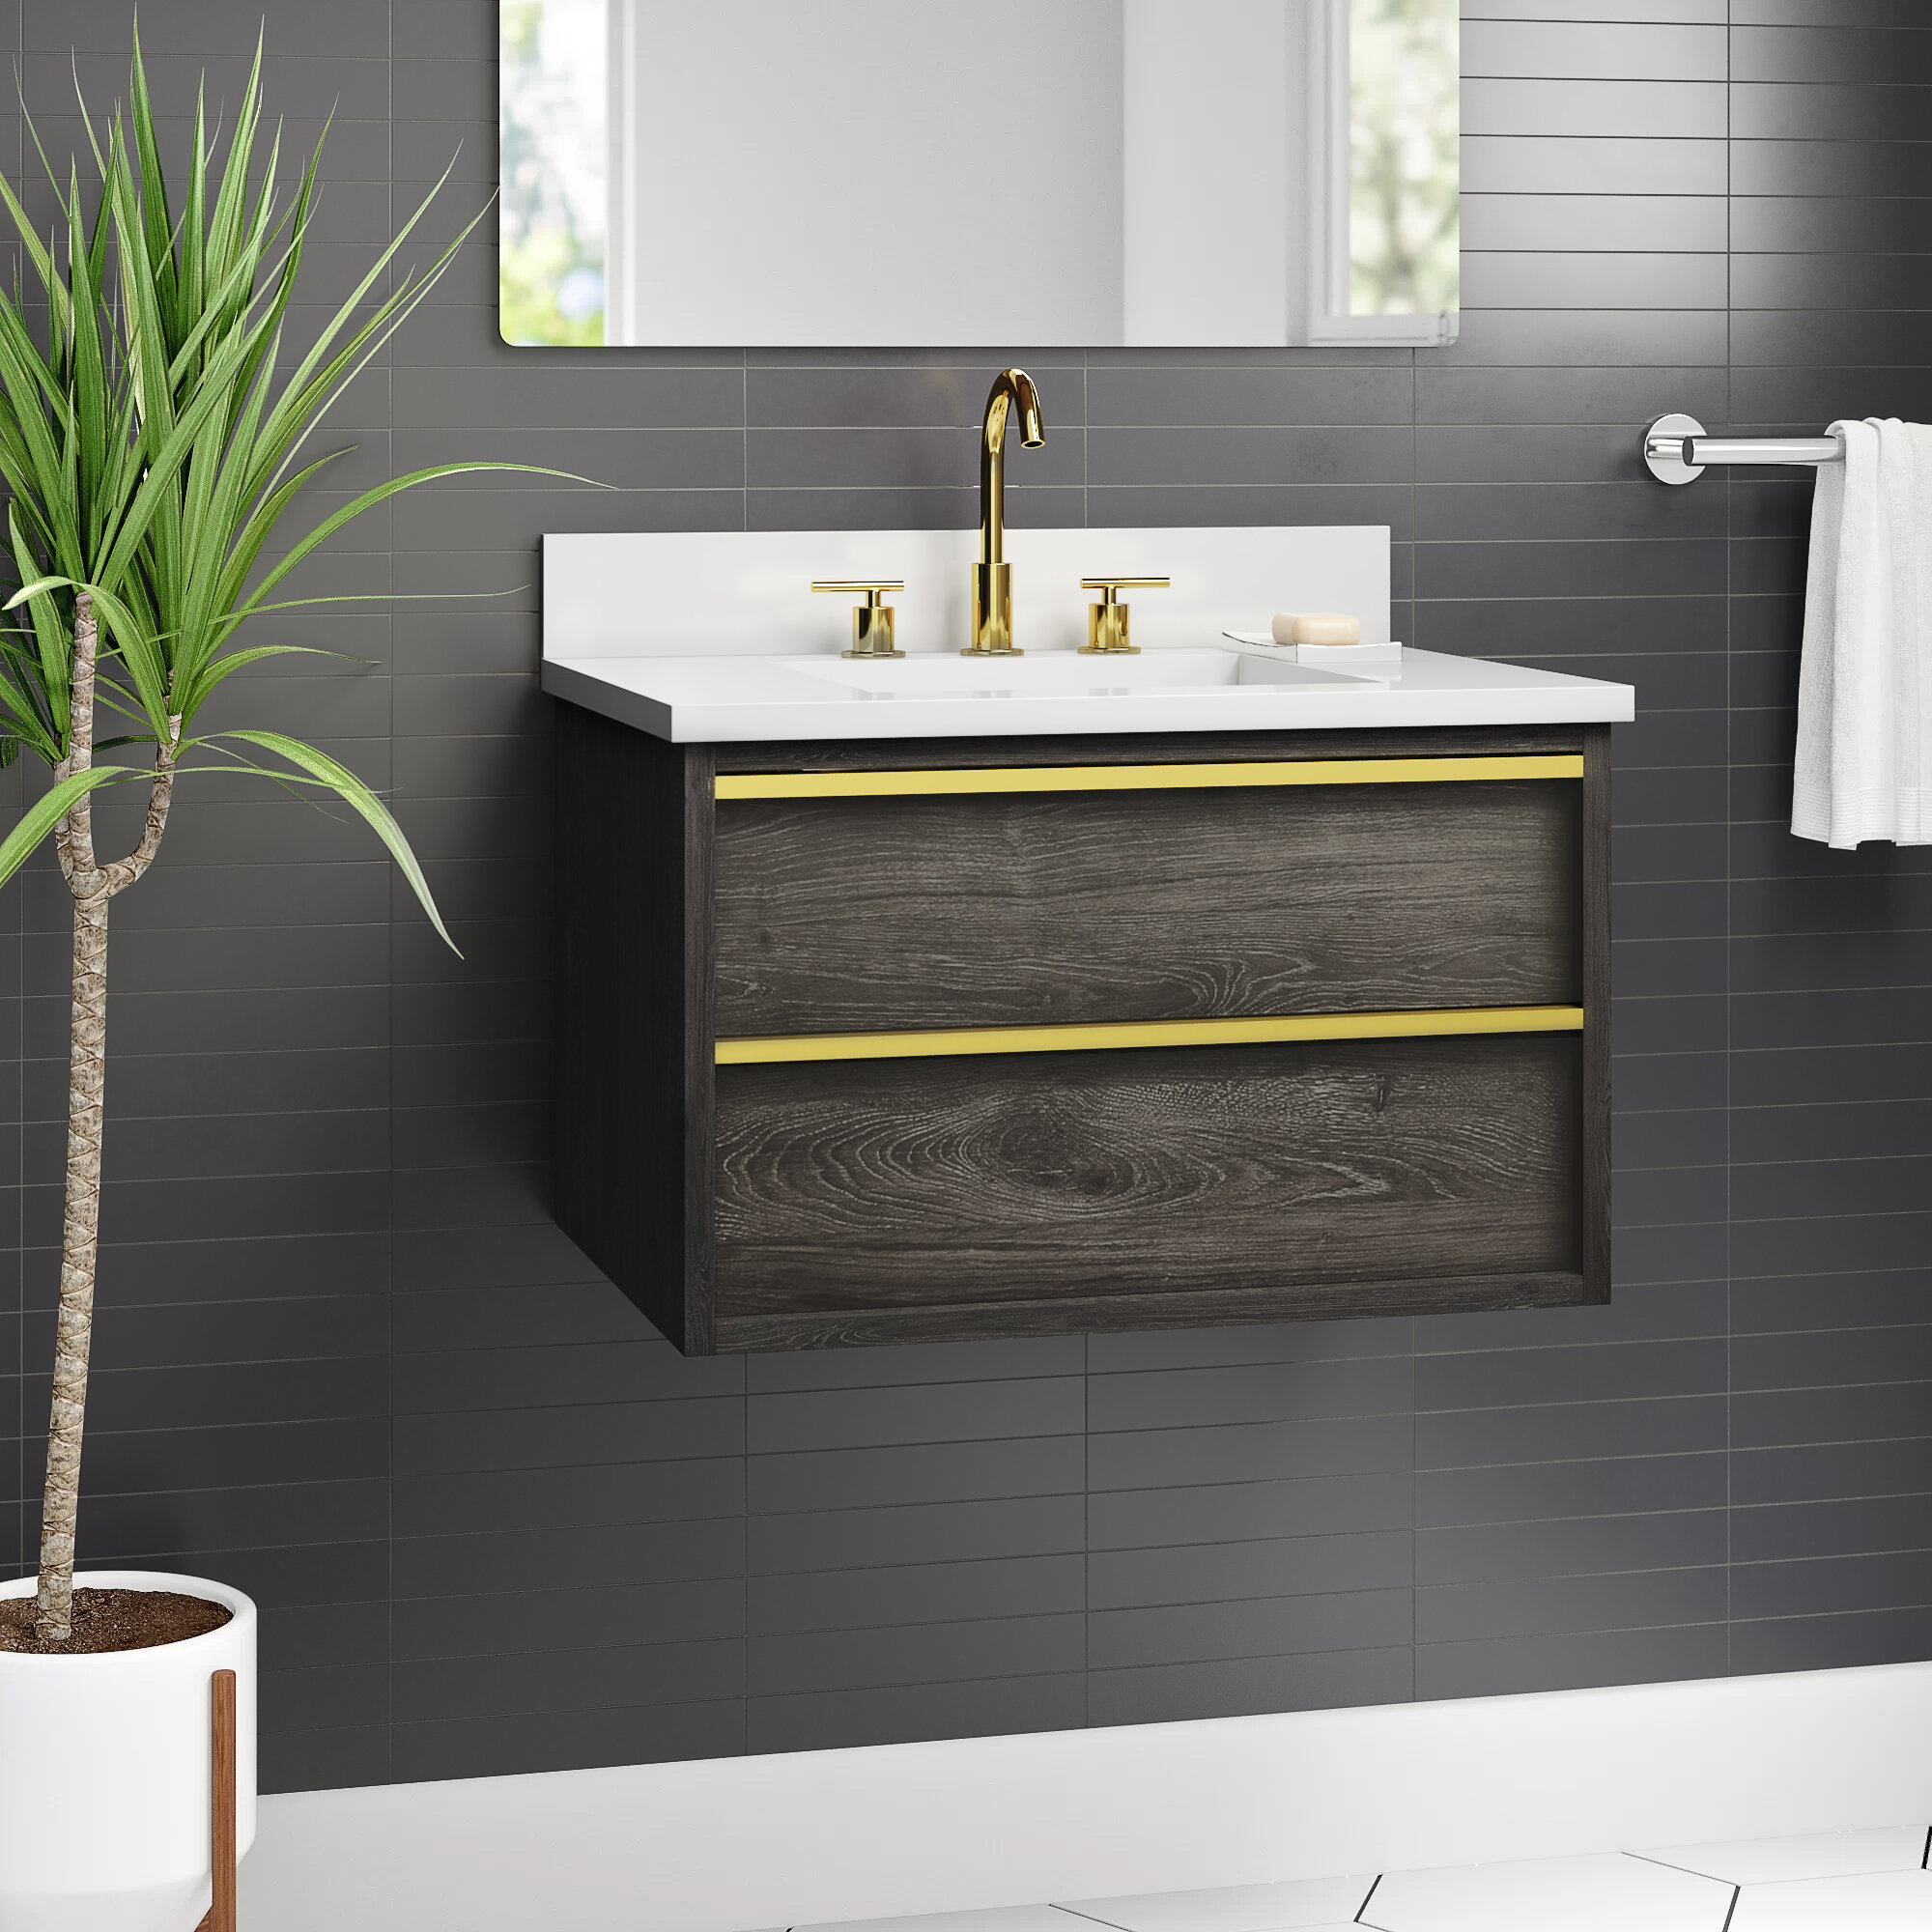 Hoye 30 Wall Mounted Single Bathroom Vanity Set Reviews Allmodern